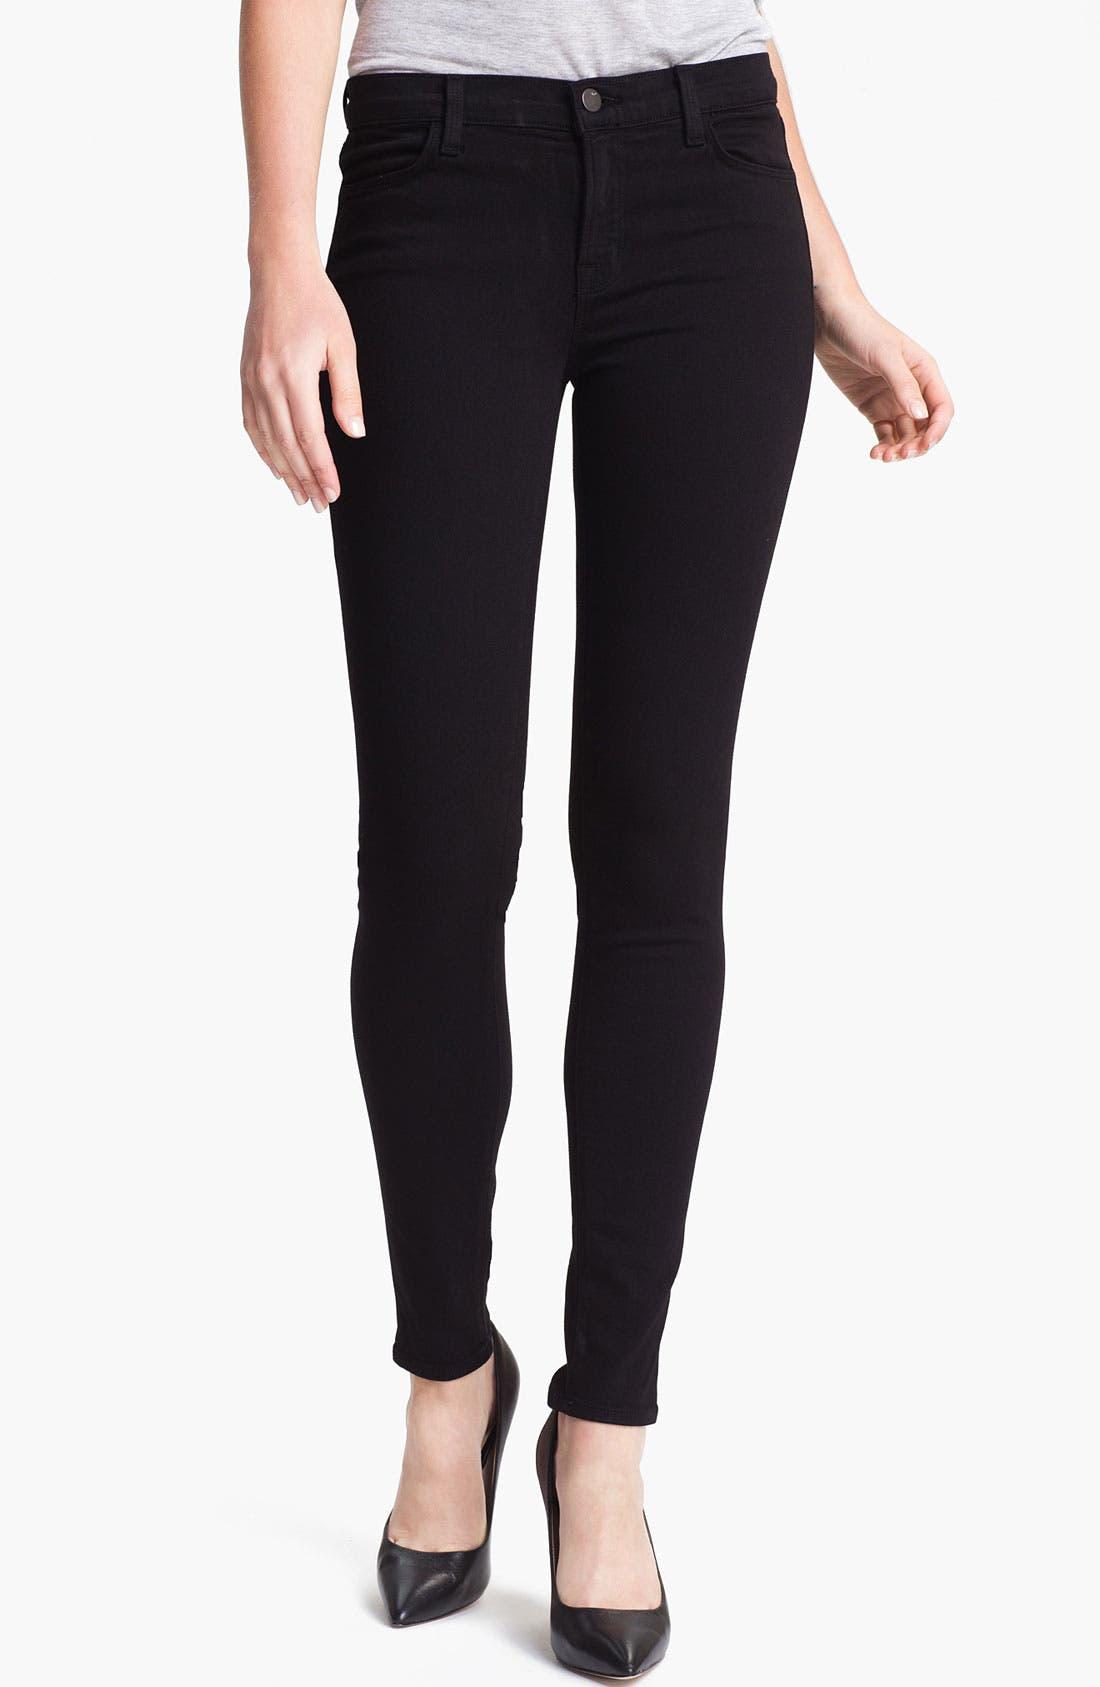 Alternate Image 1 Selected - J Brand Super Skinny Stretch Jeans (Black)